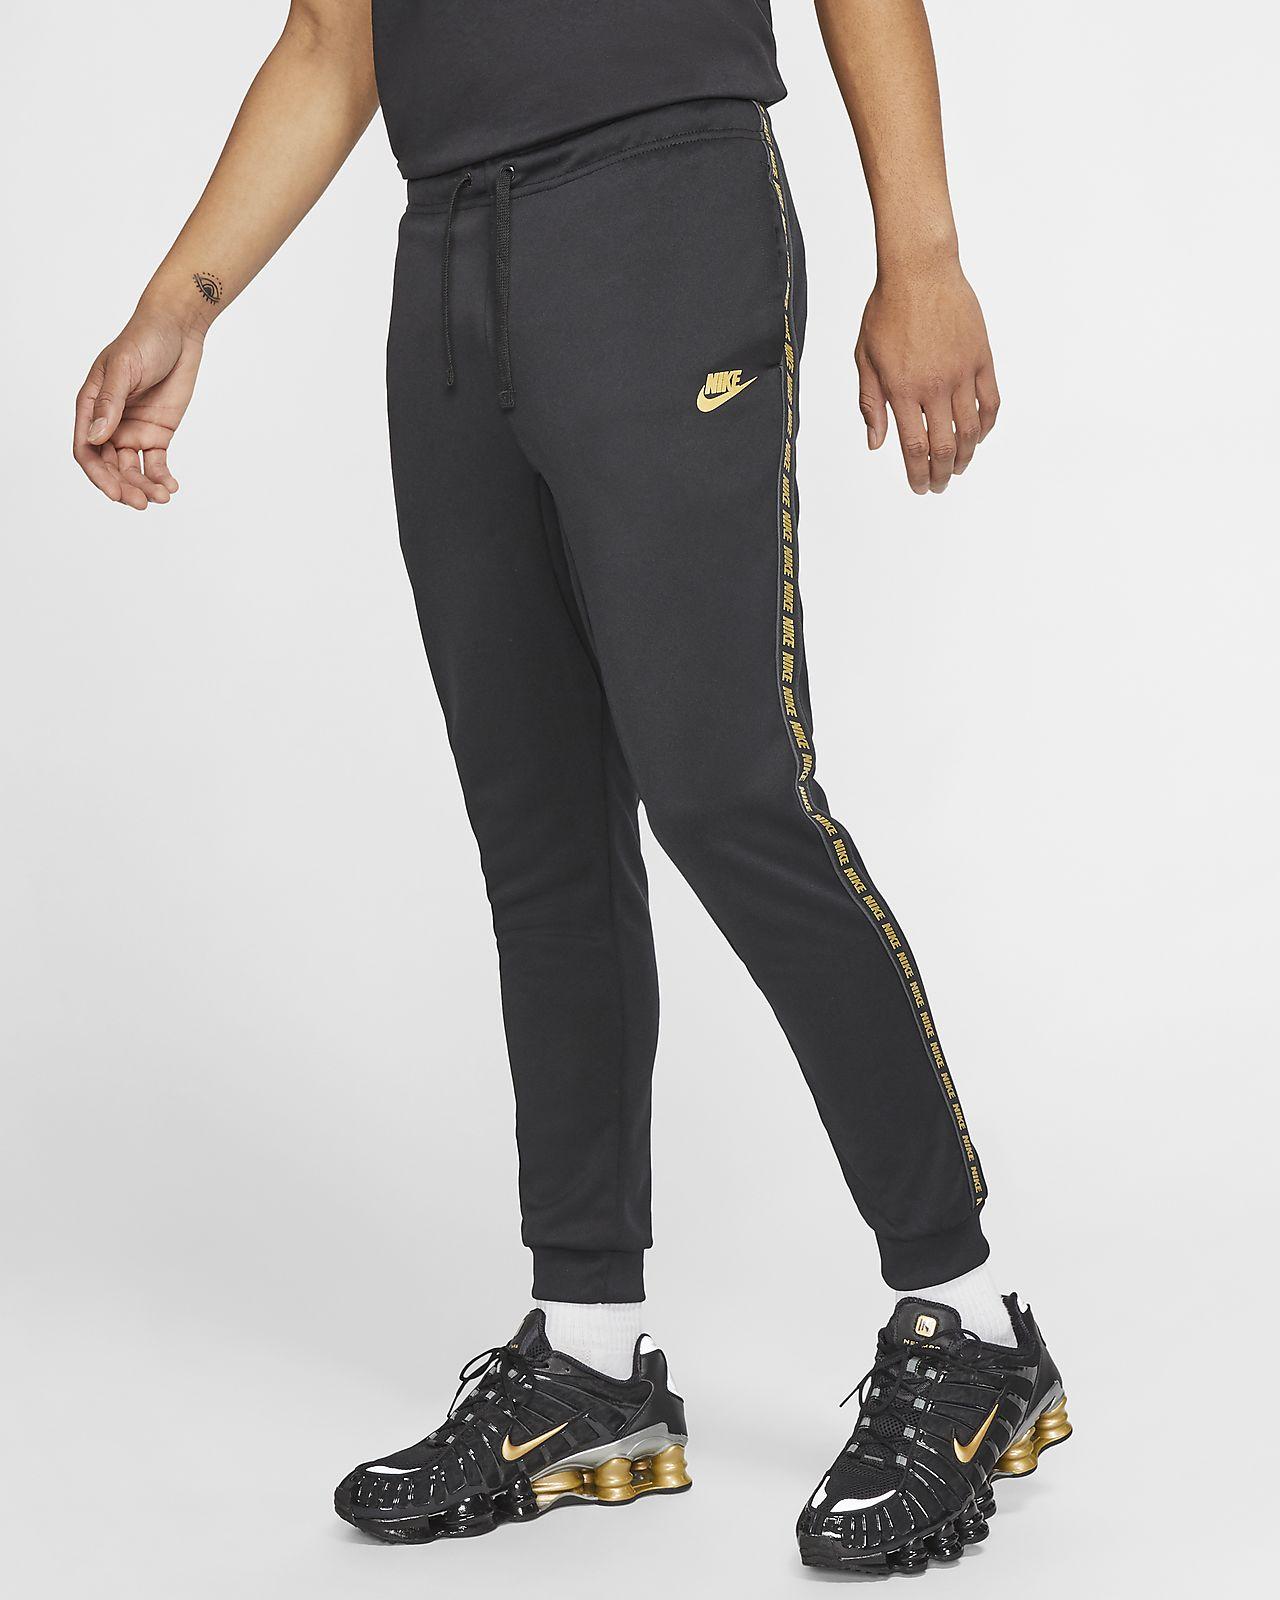 pantaloni sportswear nike uomo